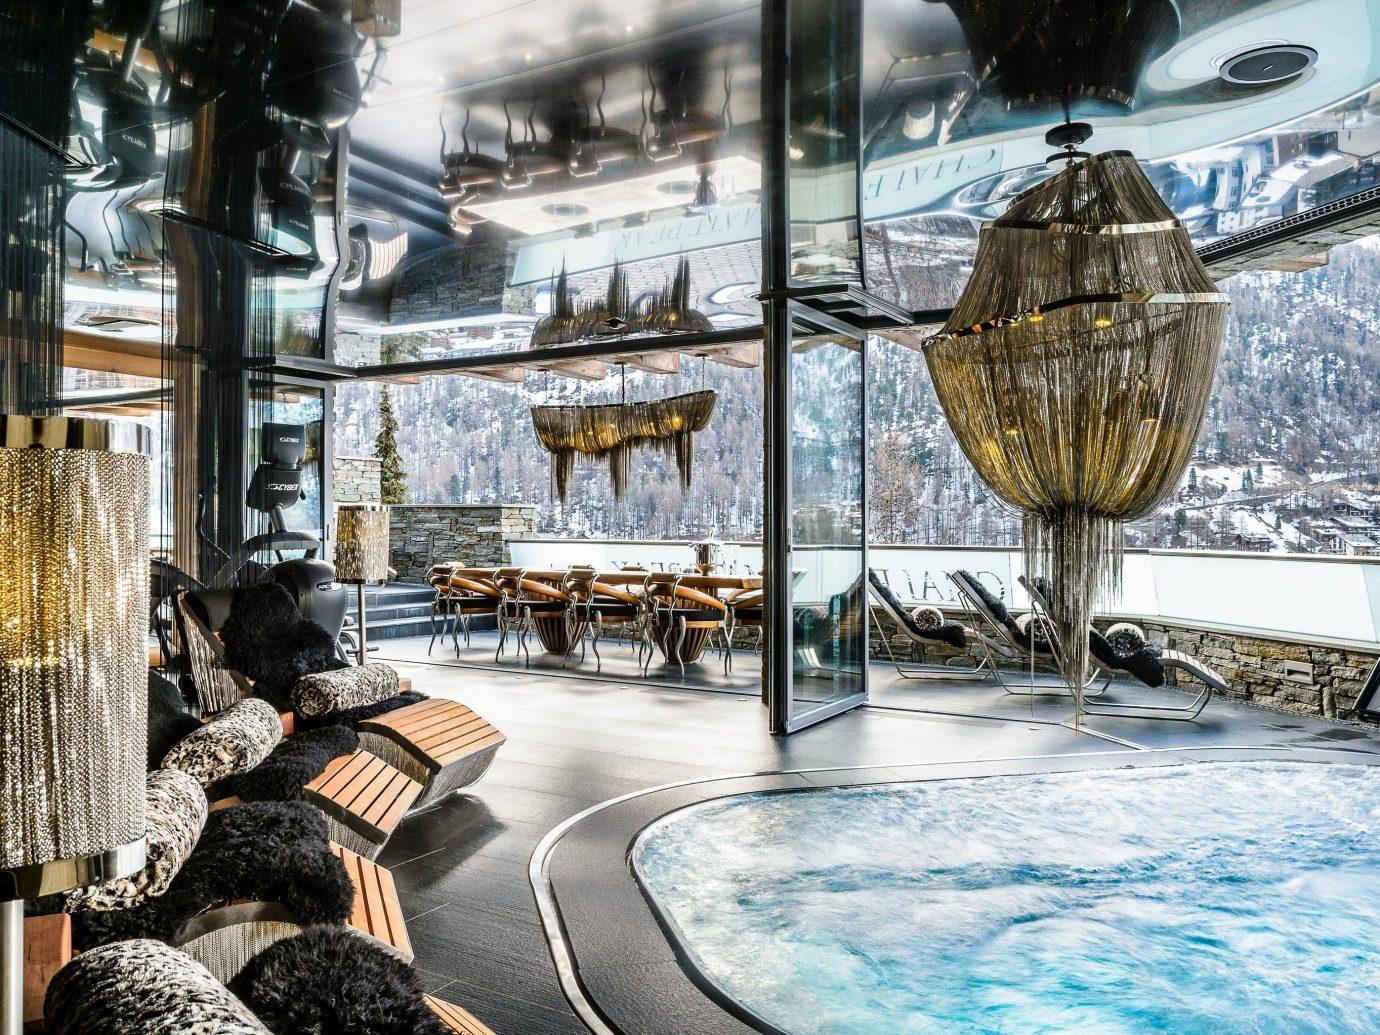 Hotels Luxury Travel Mountains + Skiing Trip Ideas indoor art screenshot vehicle Design